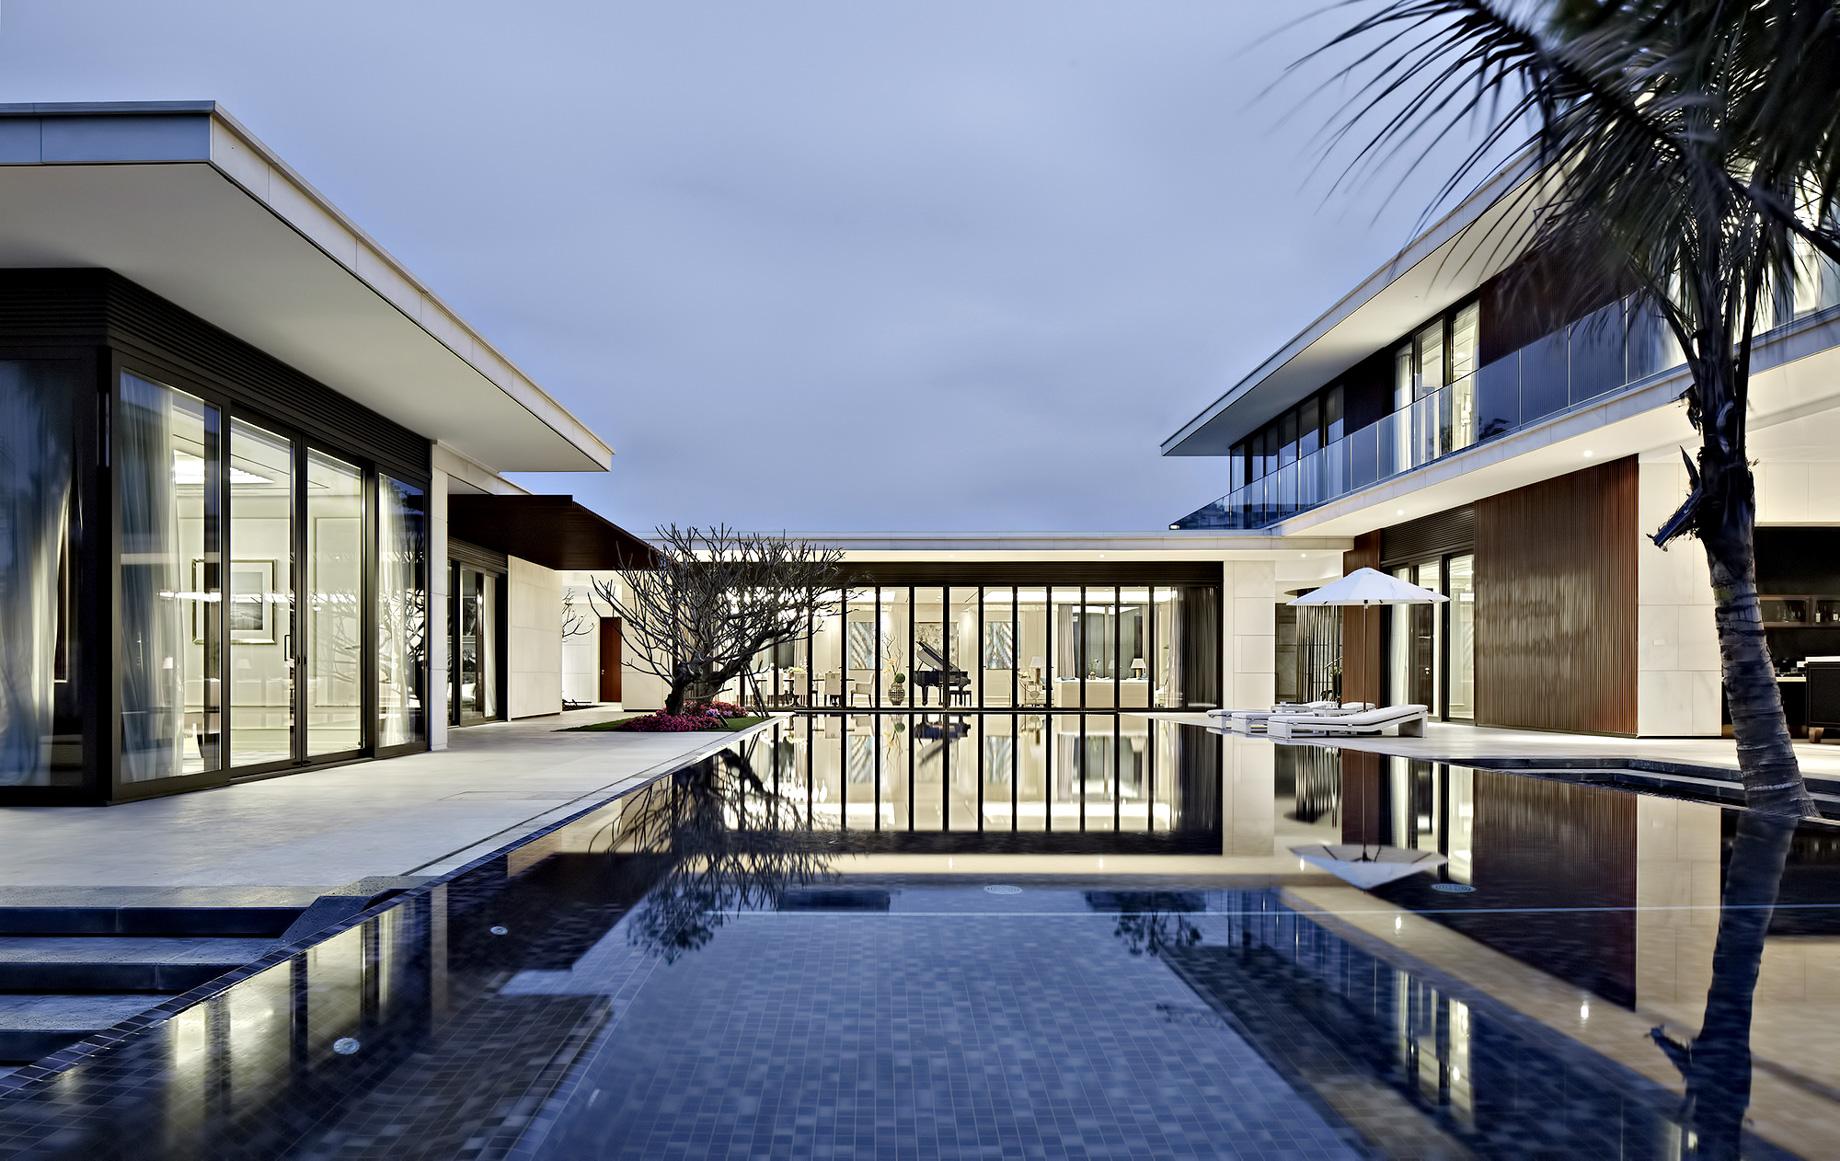 Chenglu Luxury Sea View Villas – Lingshui, Hainan, China